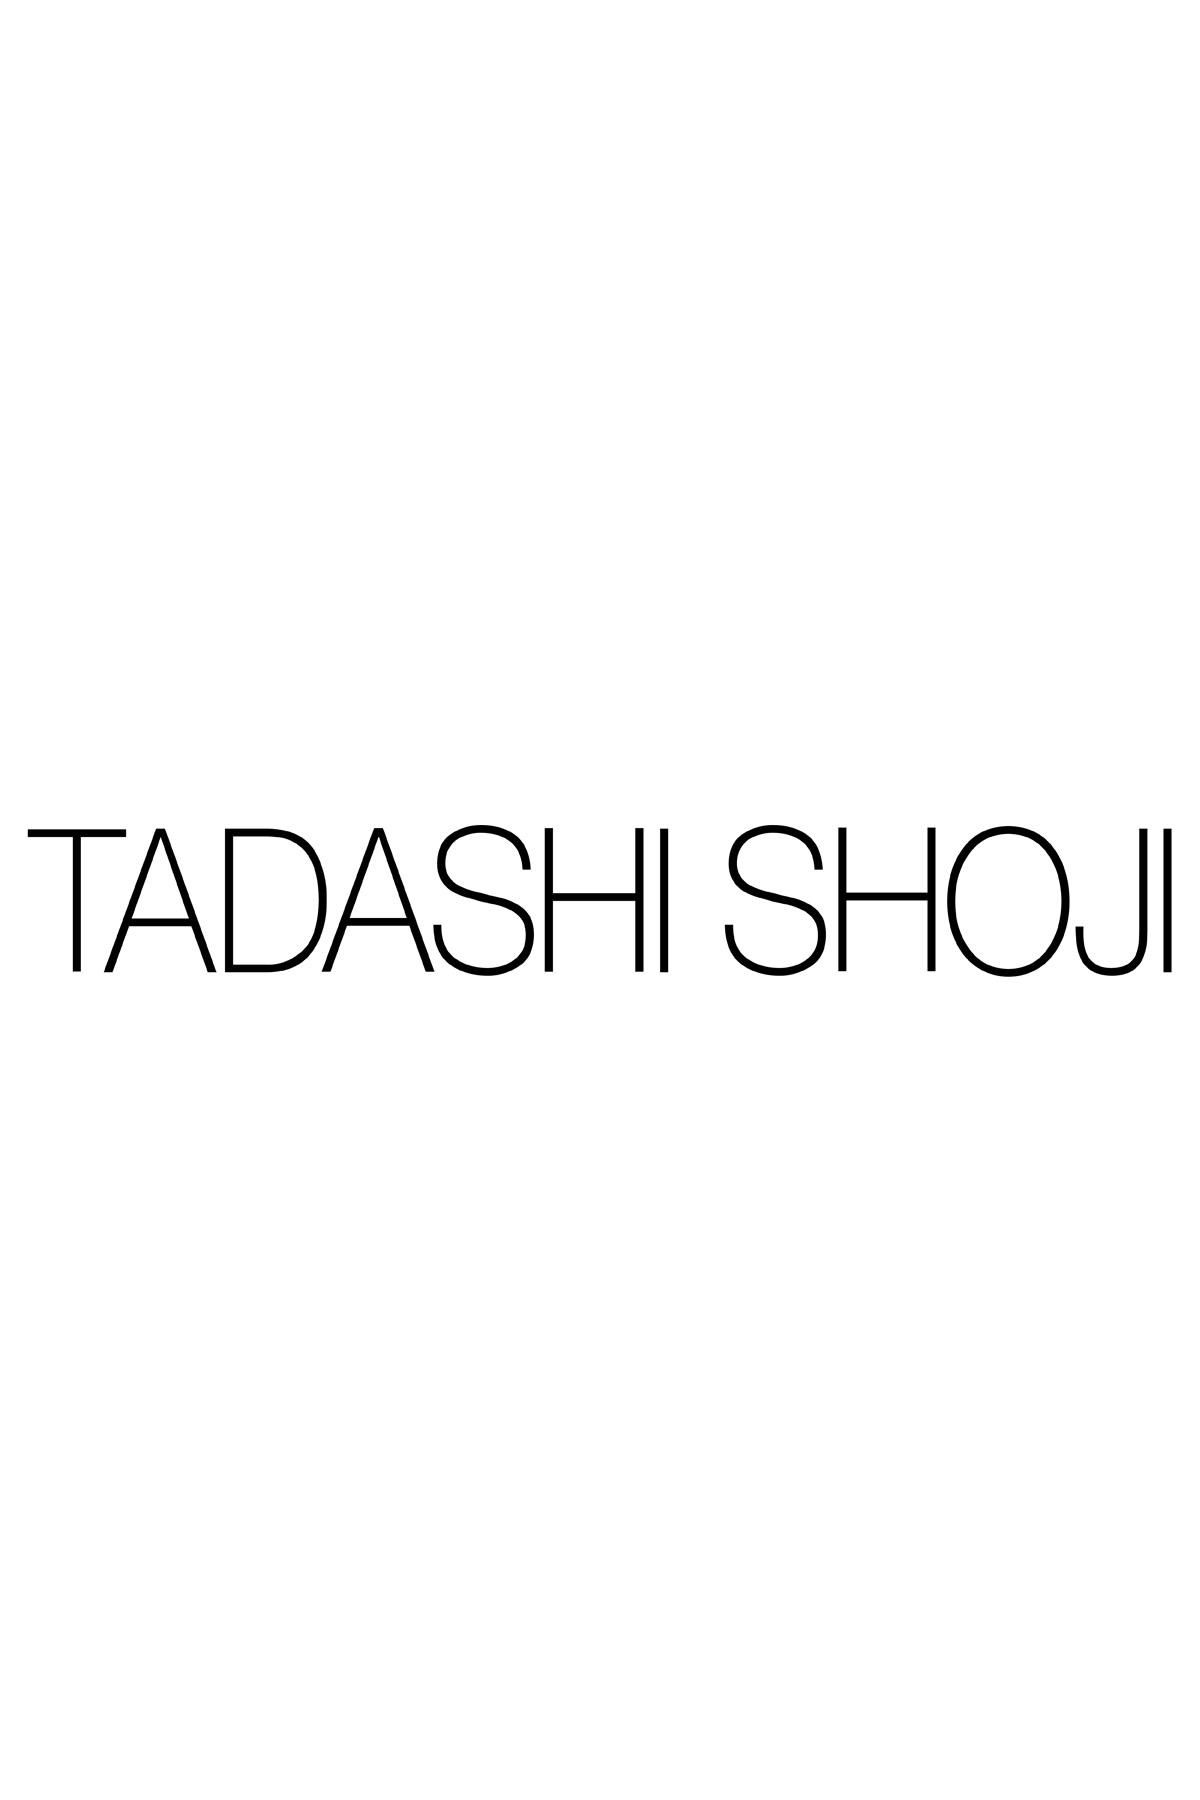 Tadashi Shoji - Jasmine Floral Embroidered Crepe Dress - PLUS SIZE